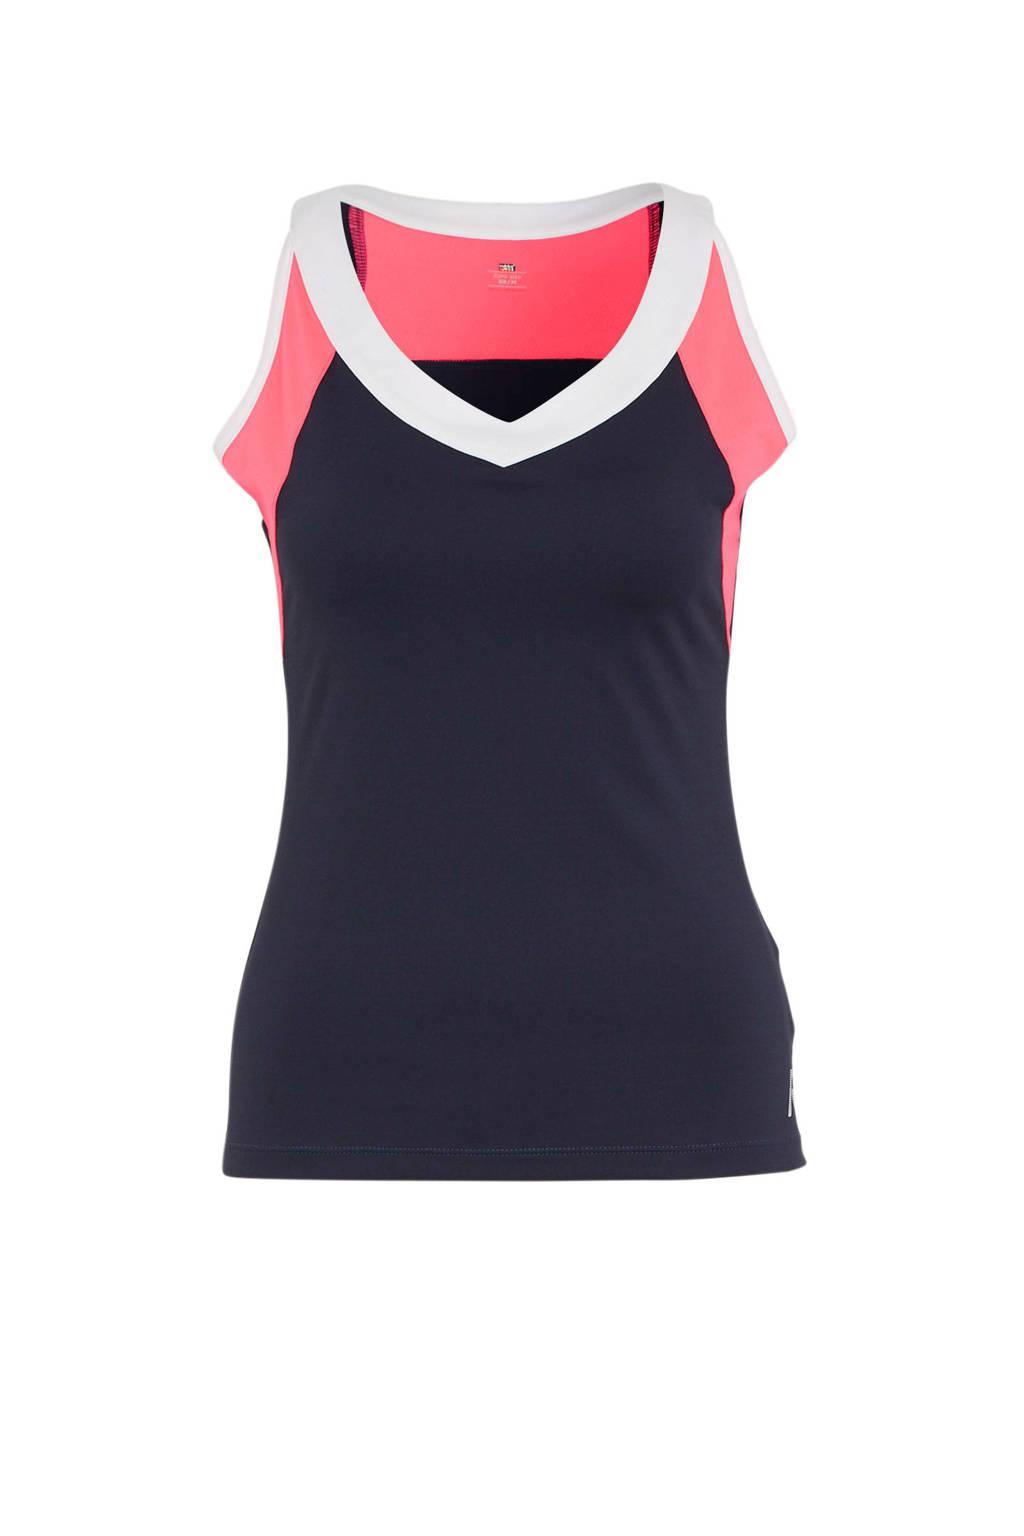 Rukka sporttop donkerblauw/roze, Donkerblauw/roze